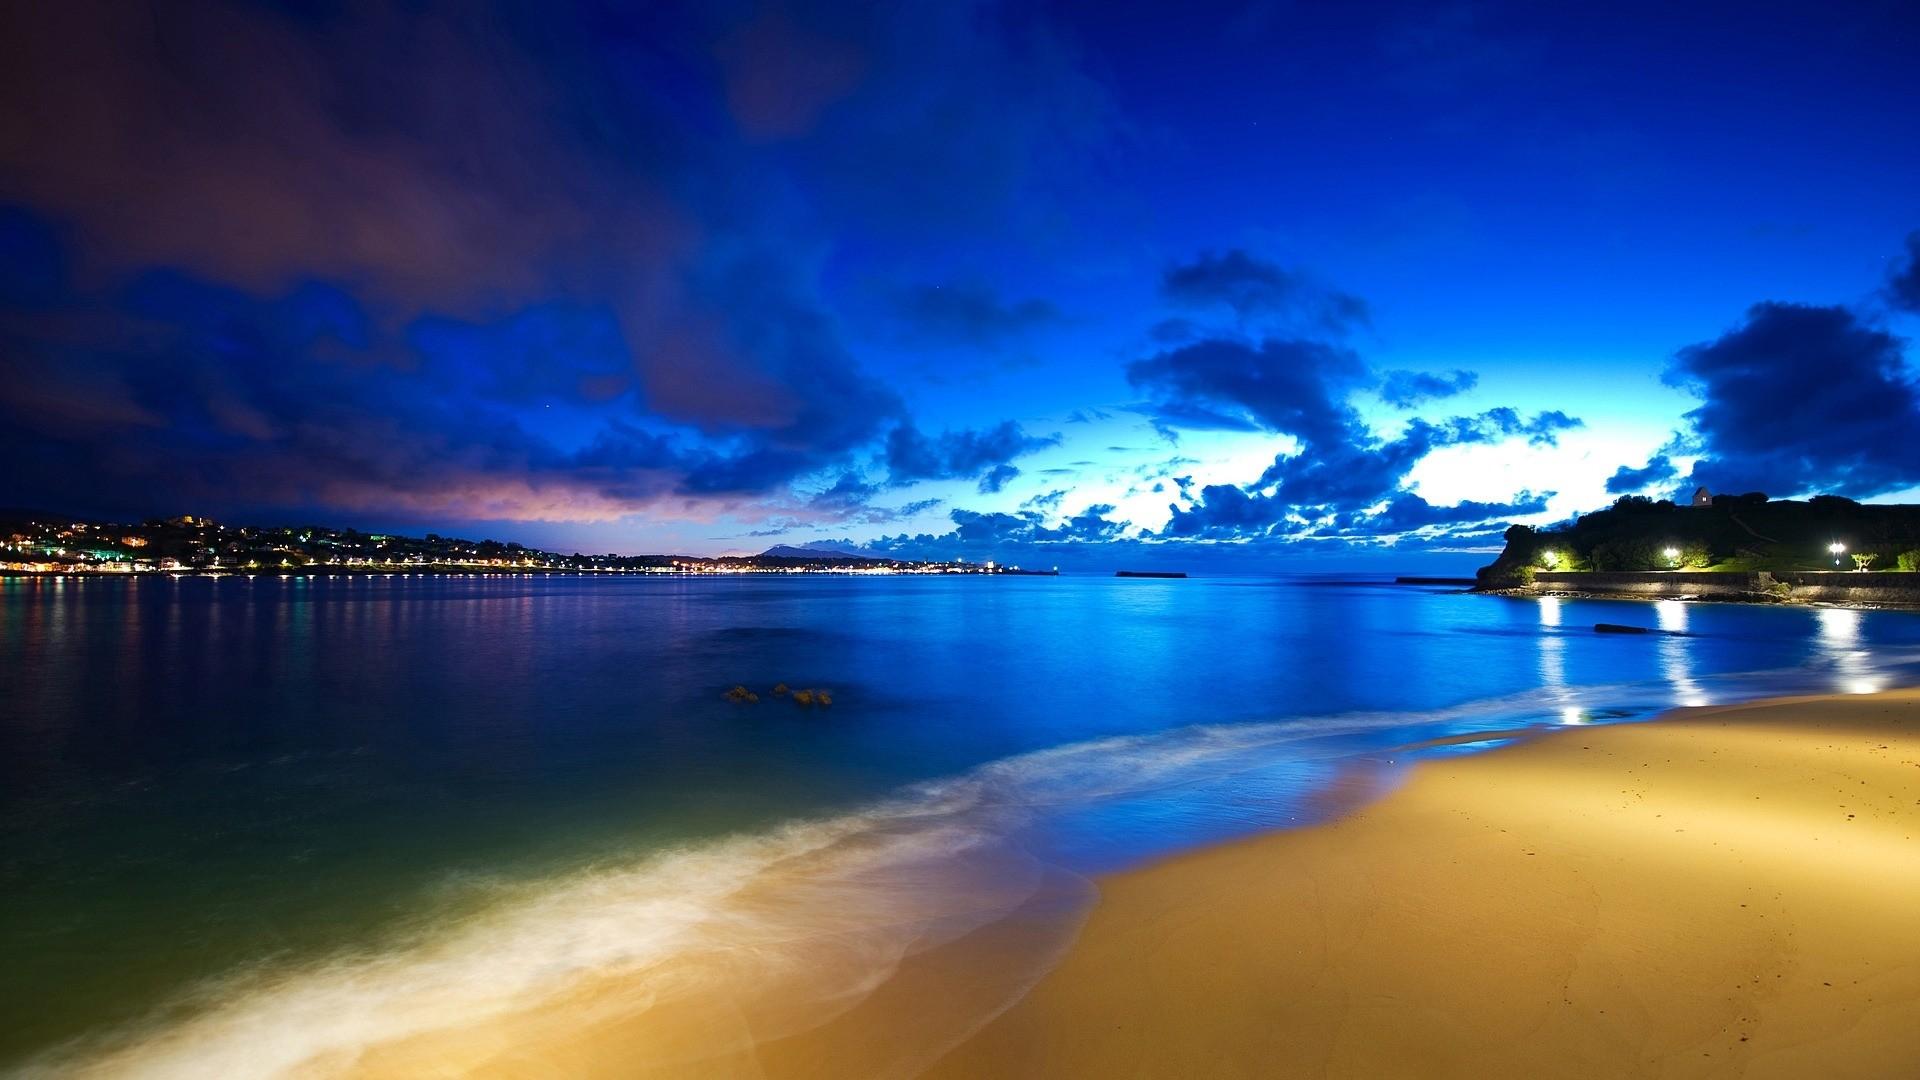 Night Beach Wallpaper Free Download